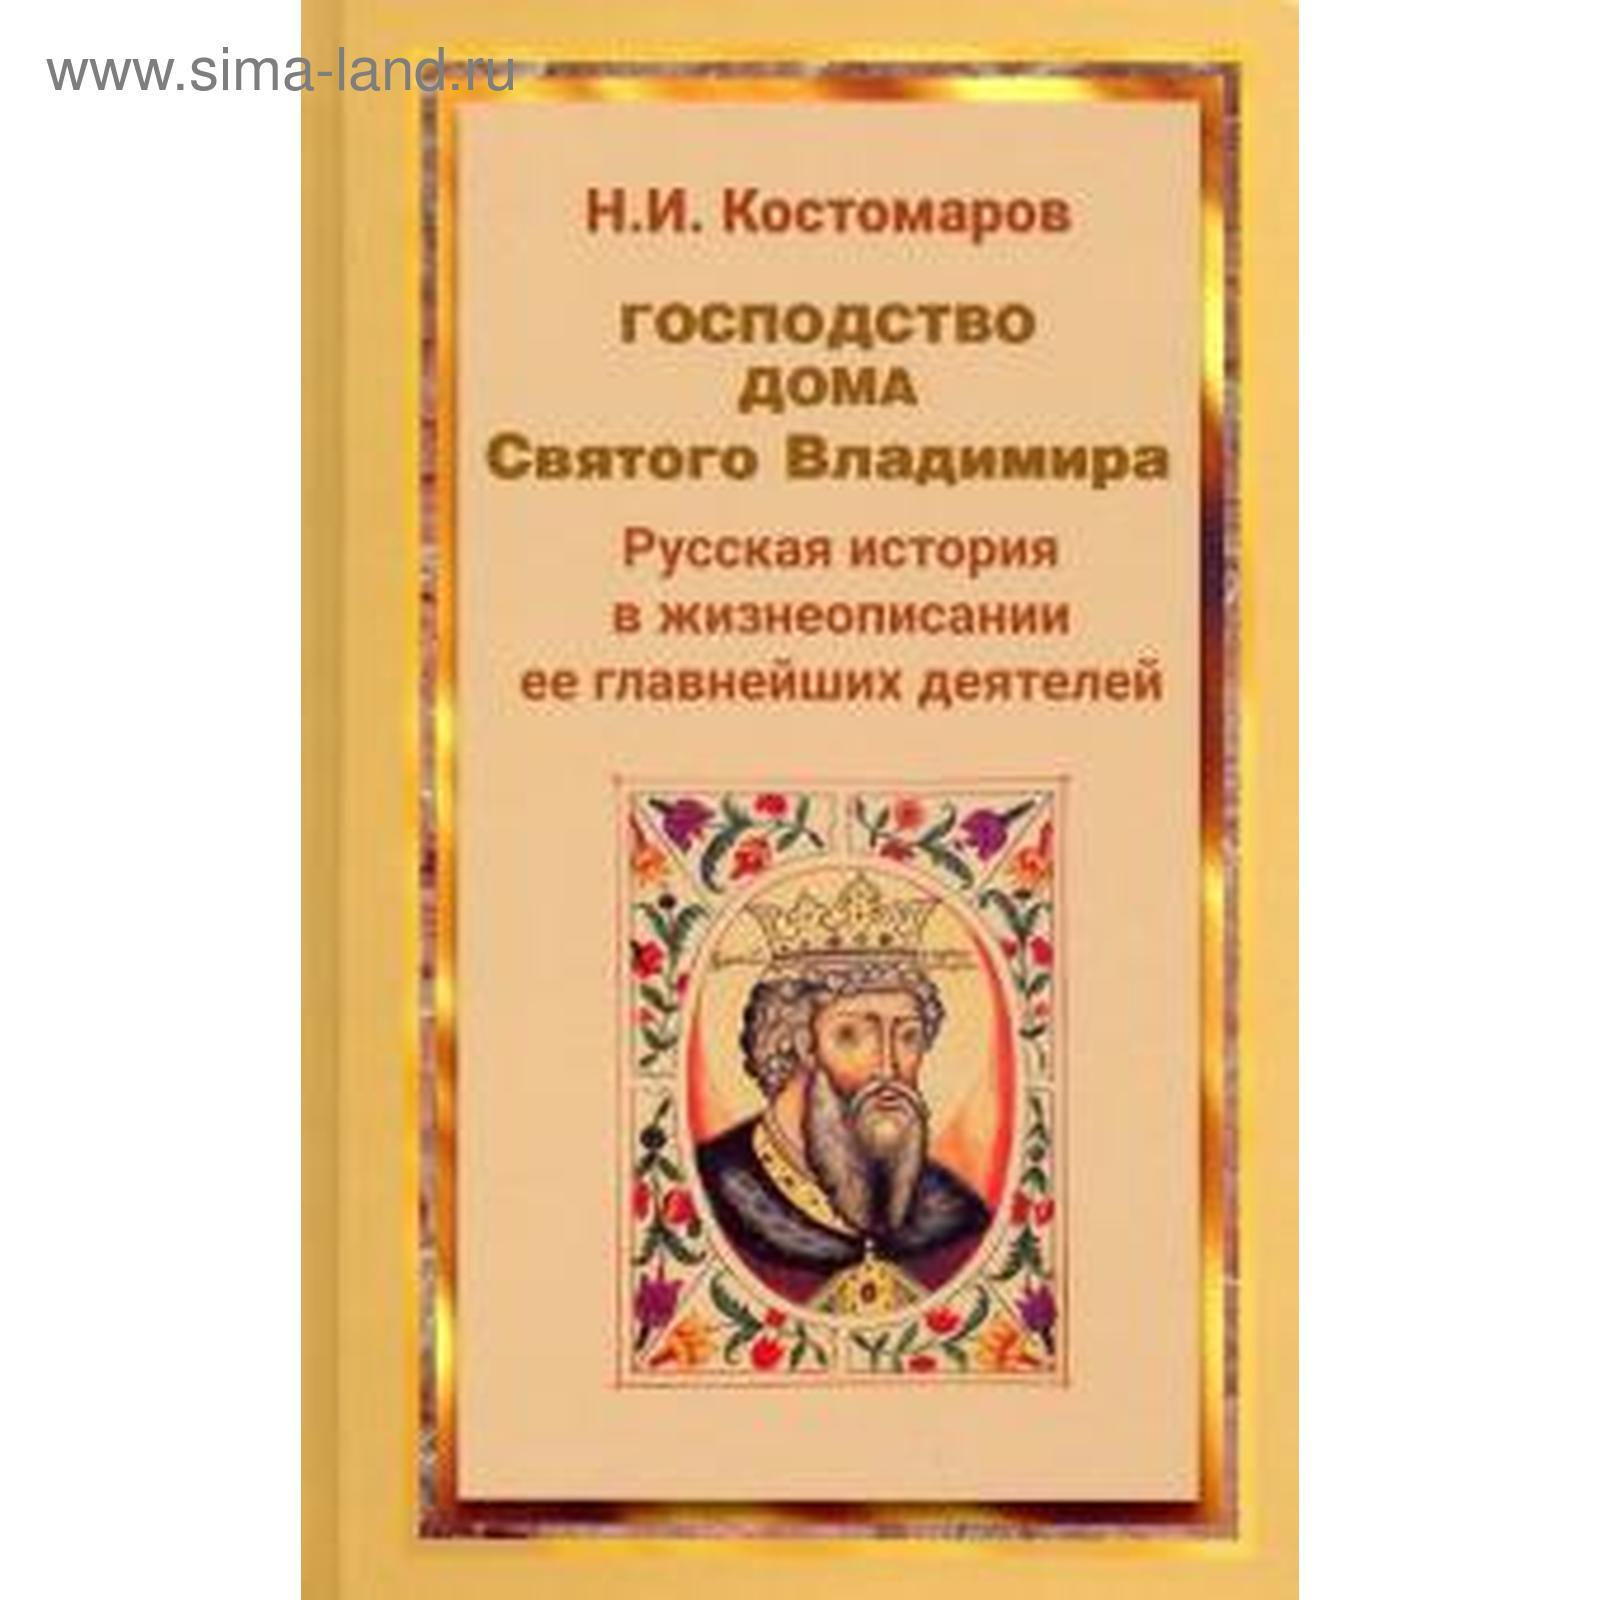 CD Господство дома св. Владимира Т.5